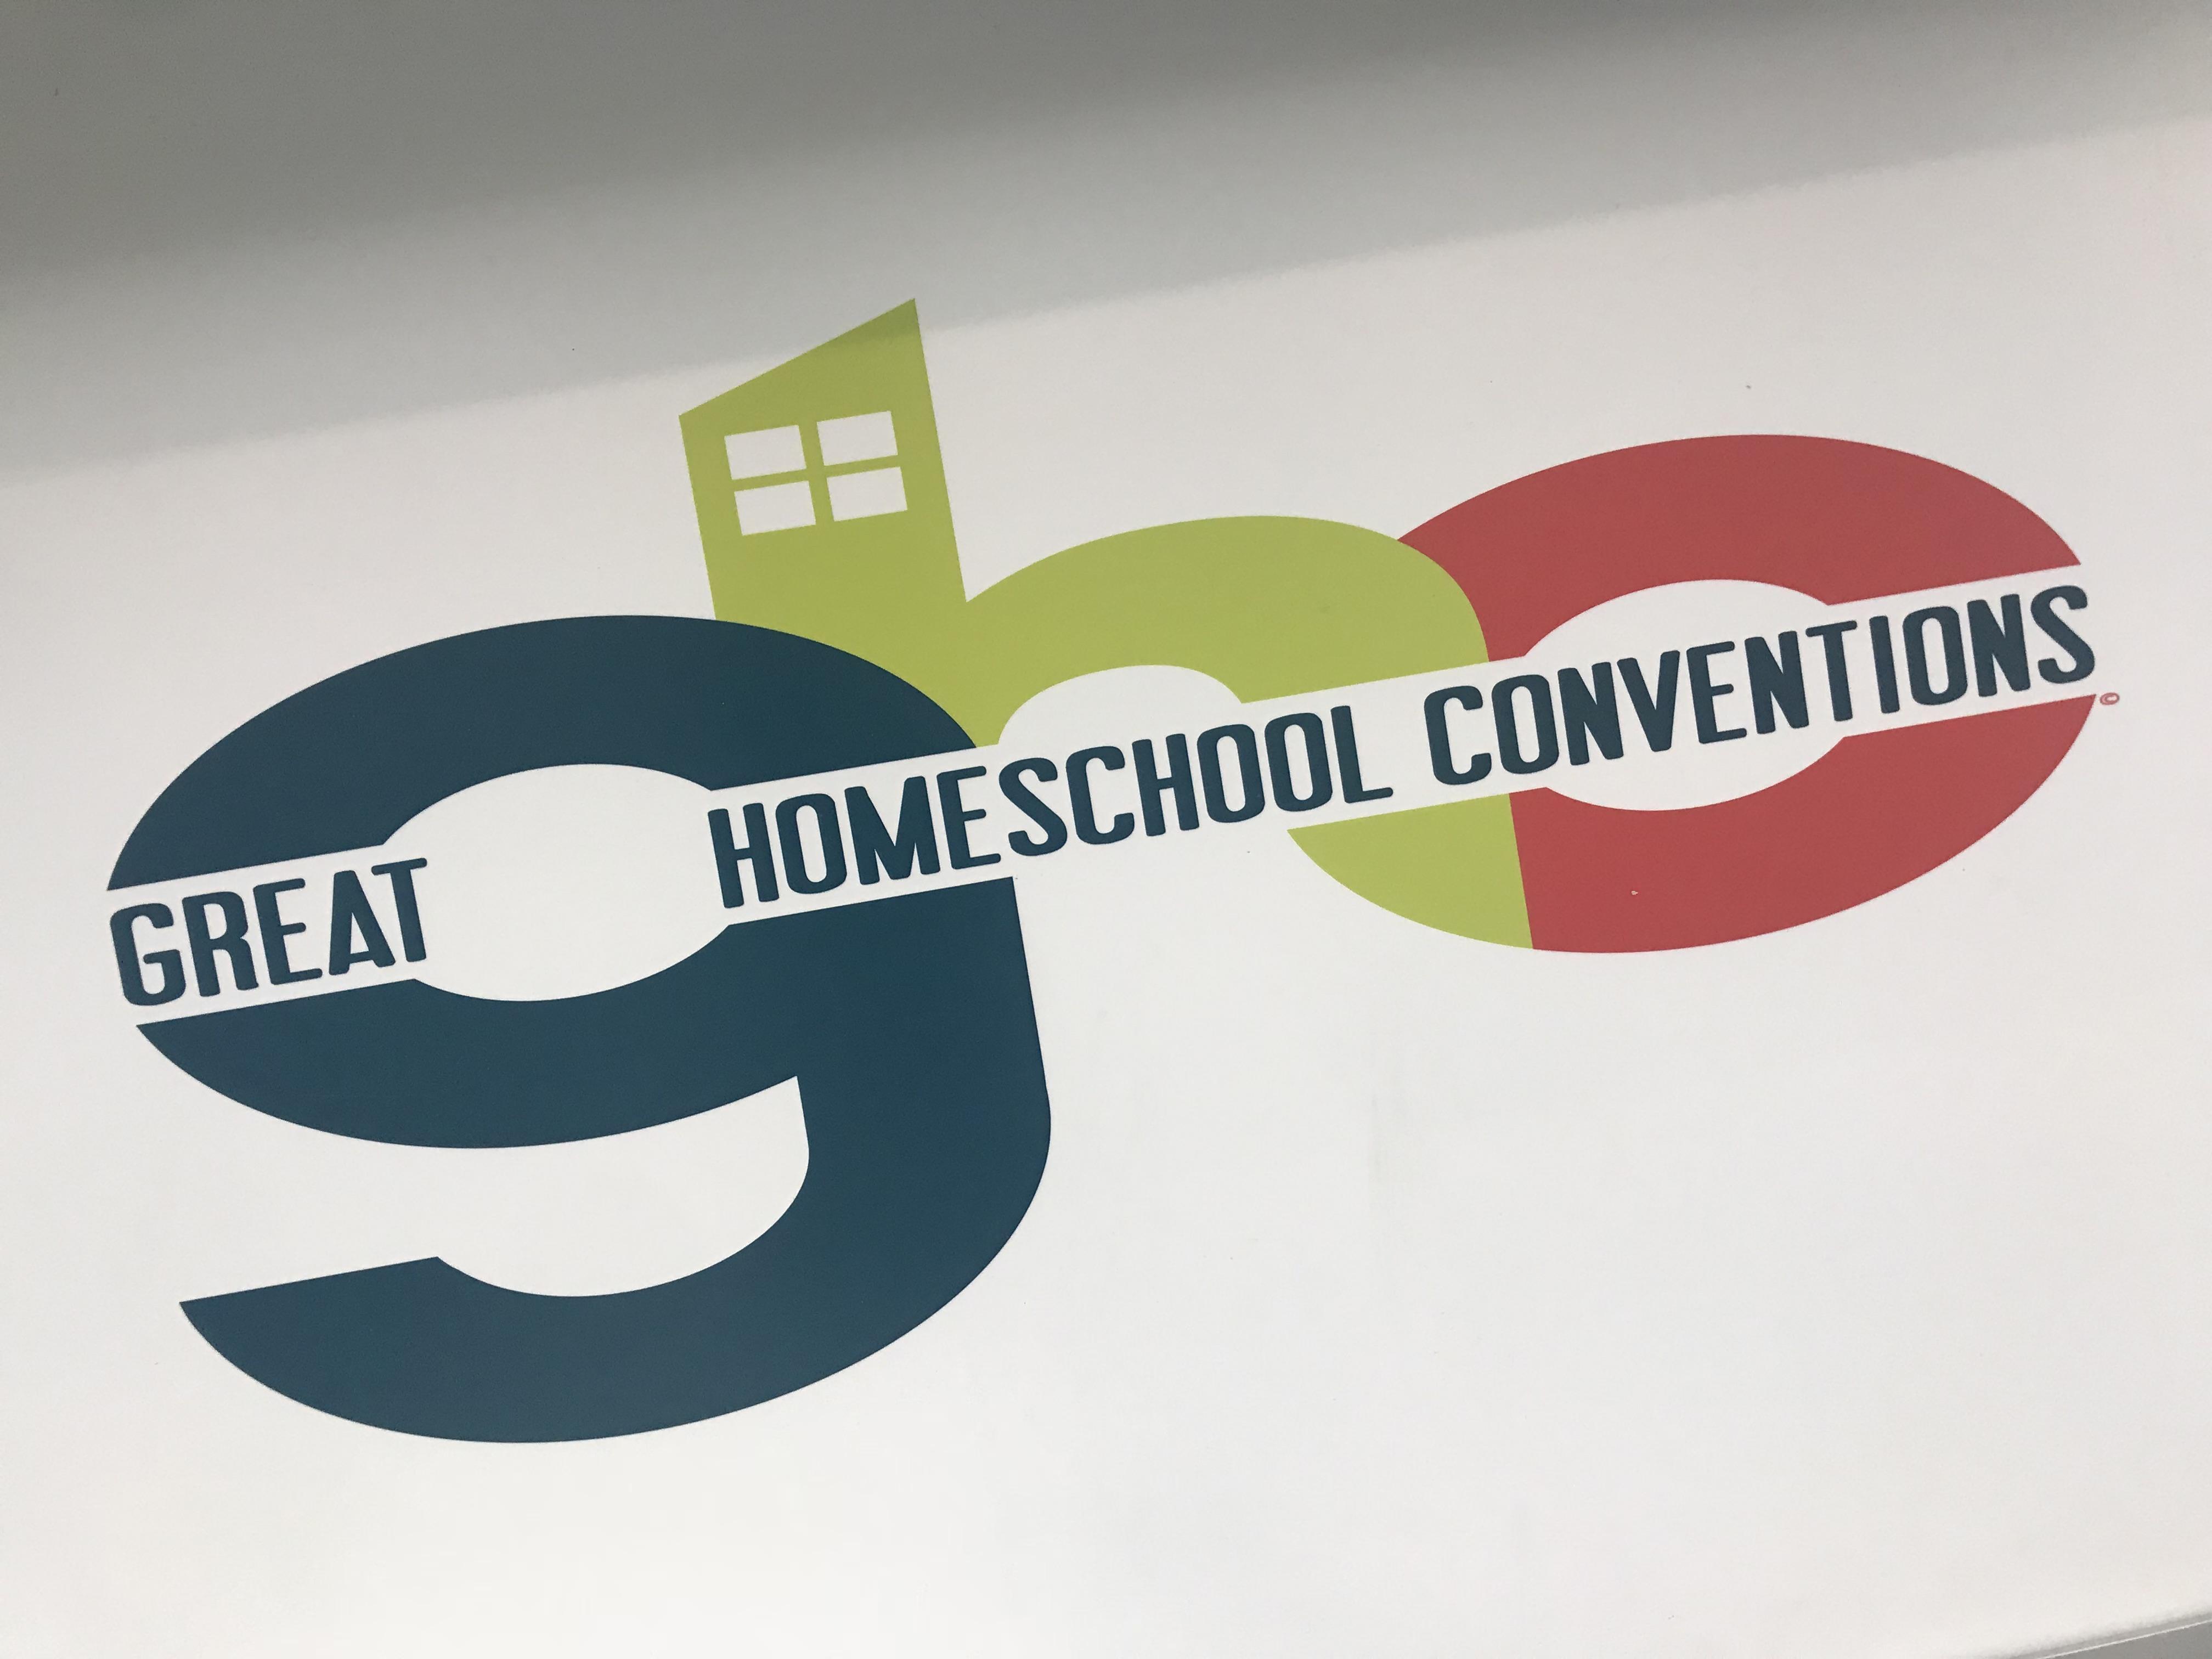 GSN Attends Homeschool Convention